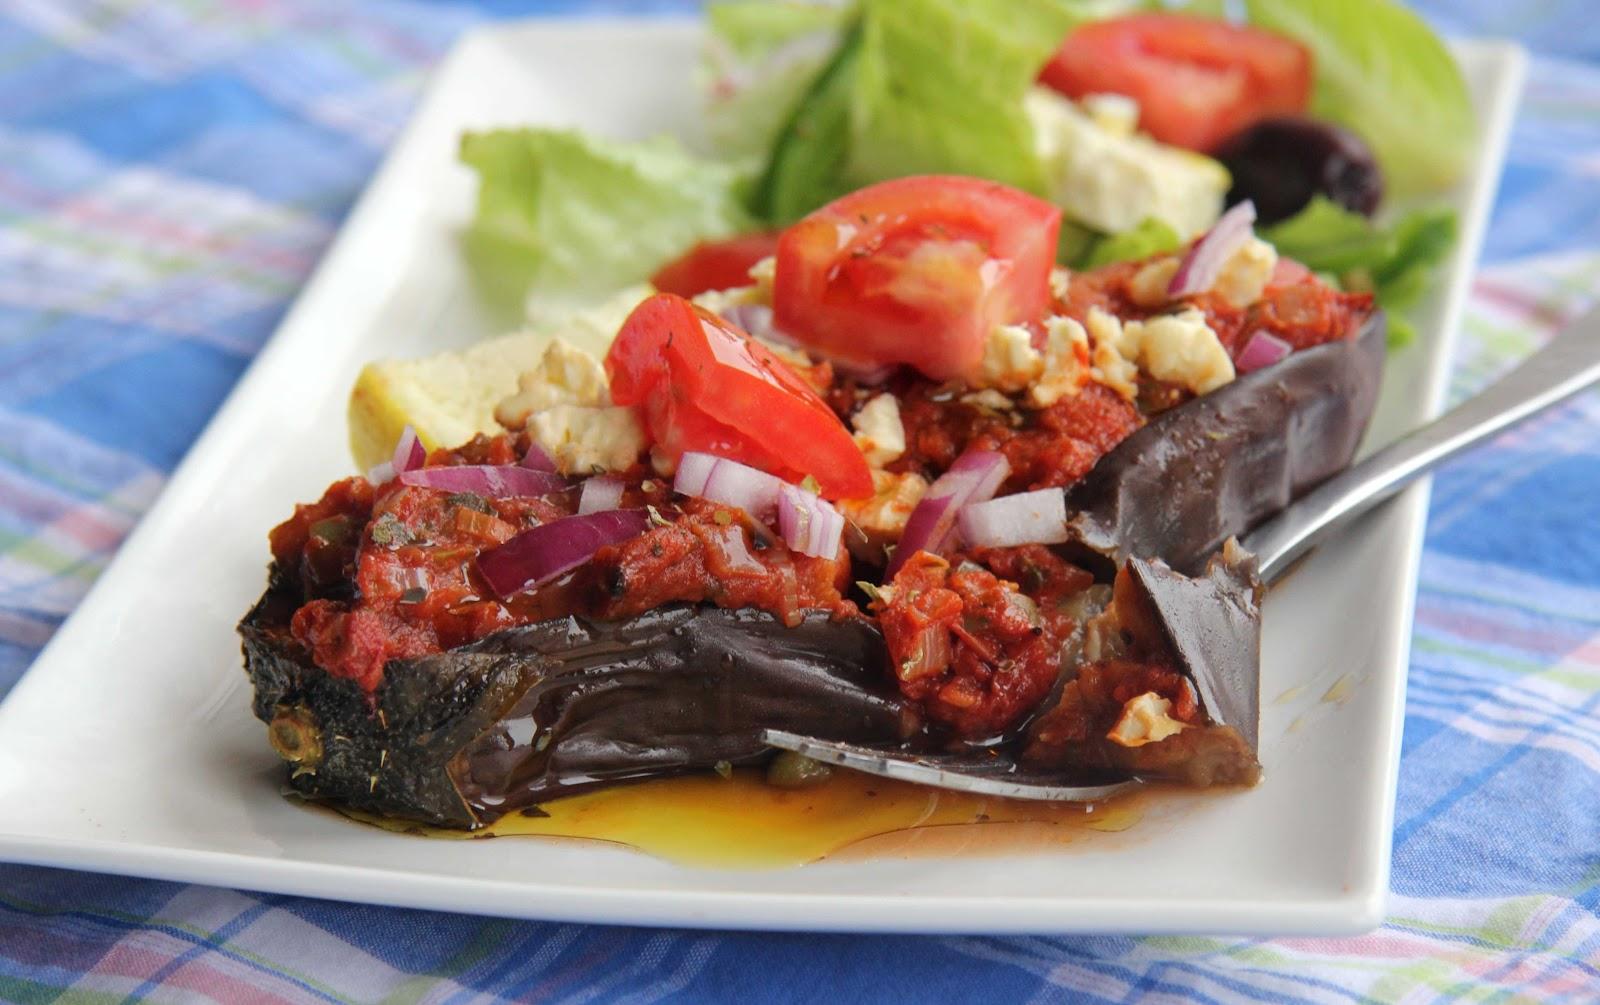 Talis tomatoes greek baked eggplant greek baked eggplant forumfinder Image collections